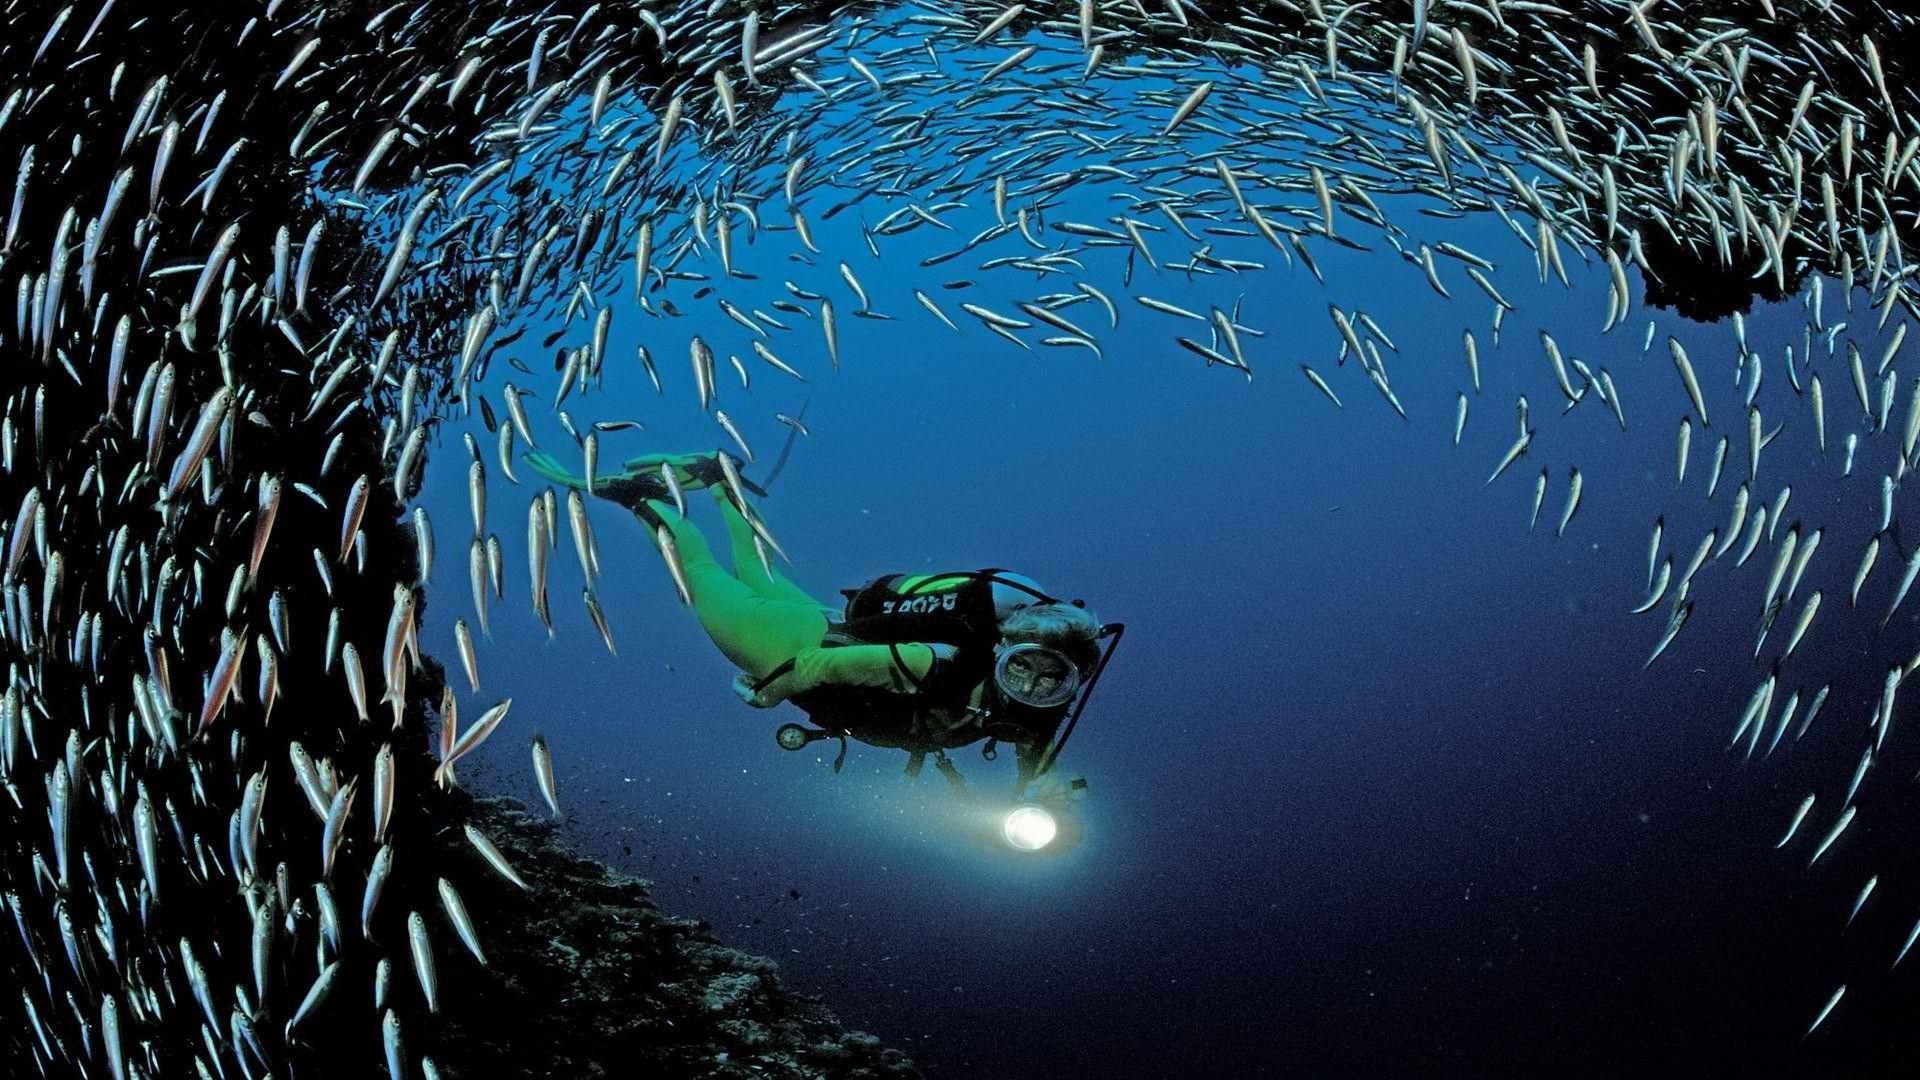 scuba diving wallpaper wallpapers - photo #10